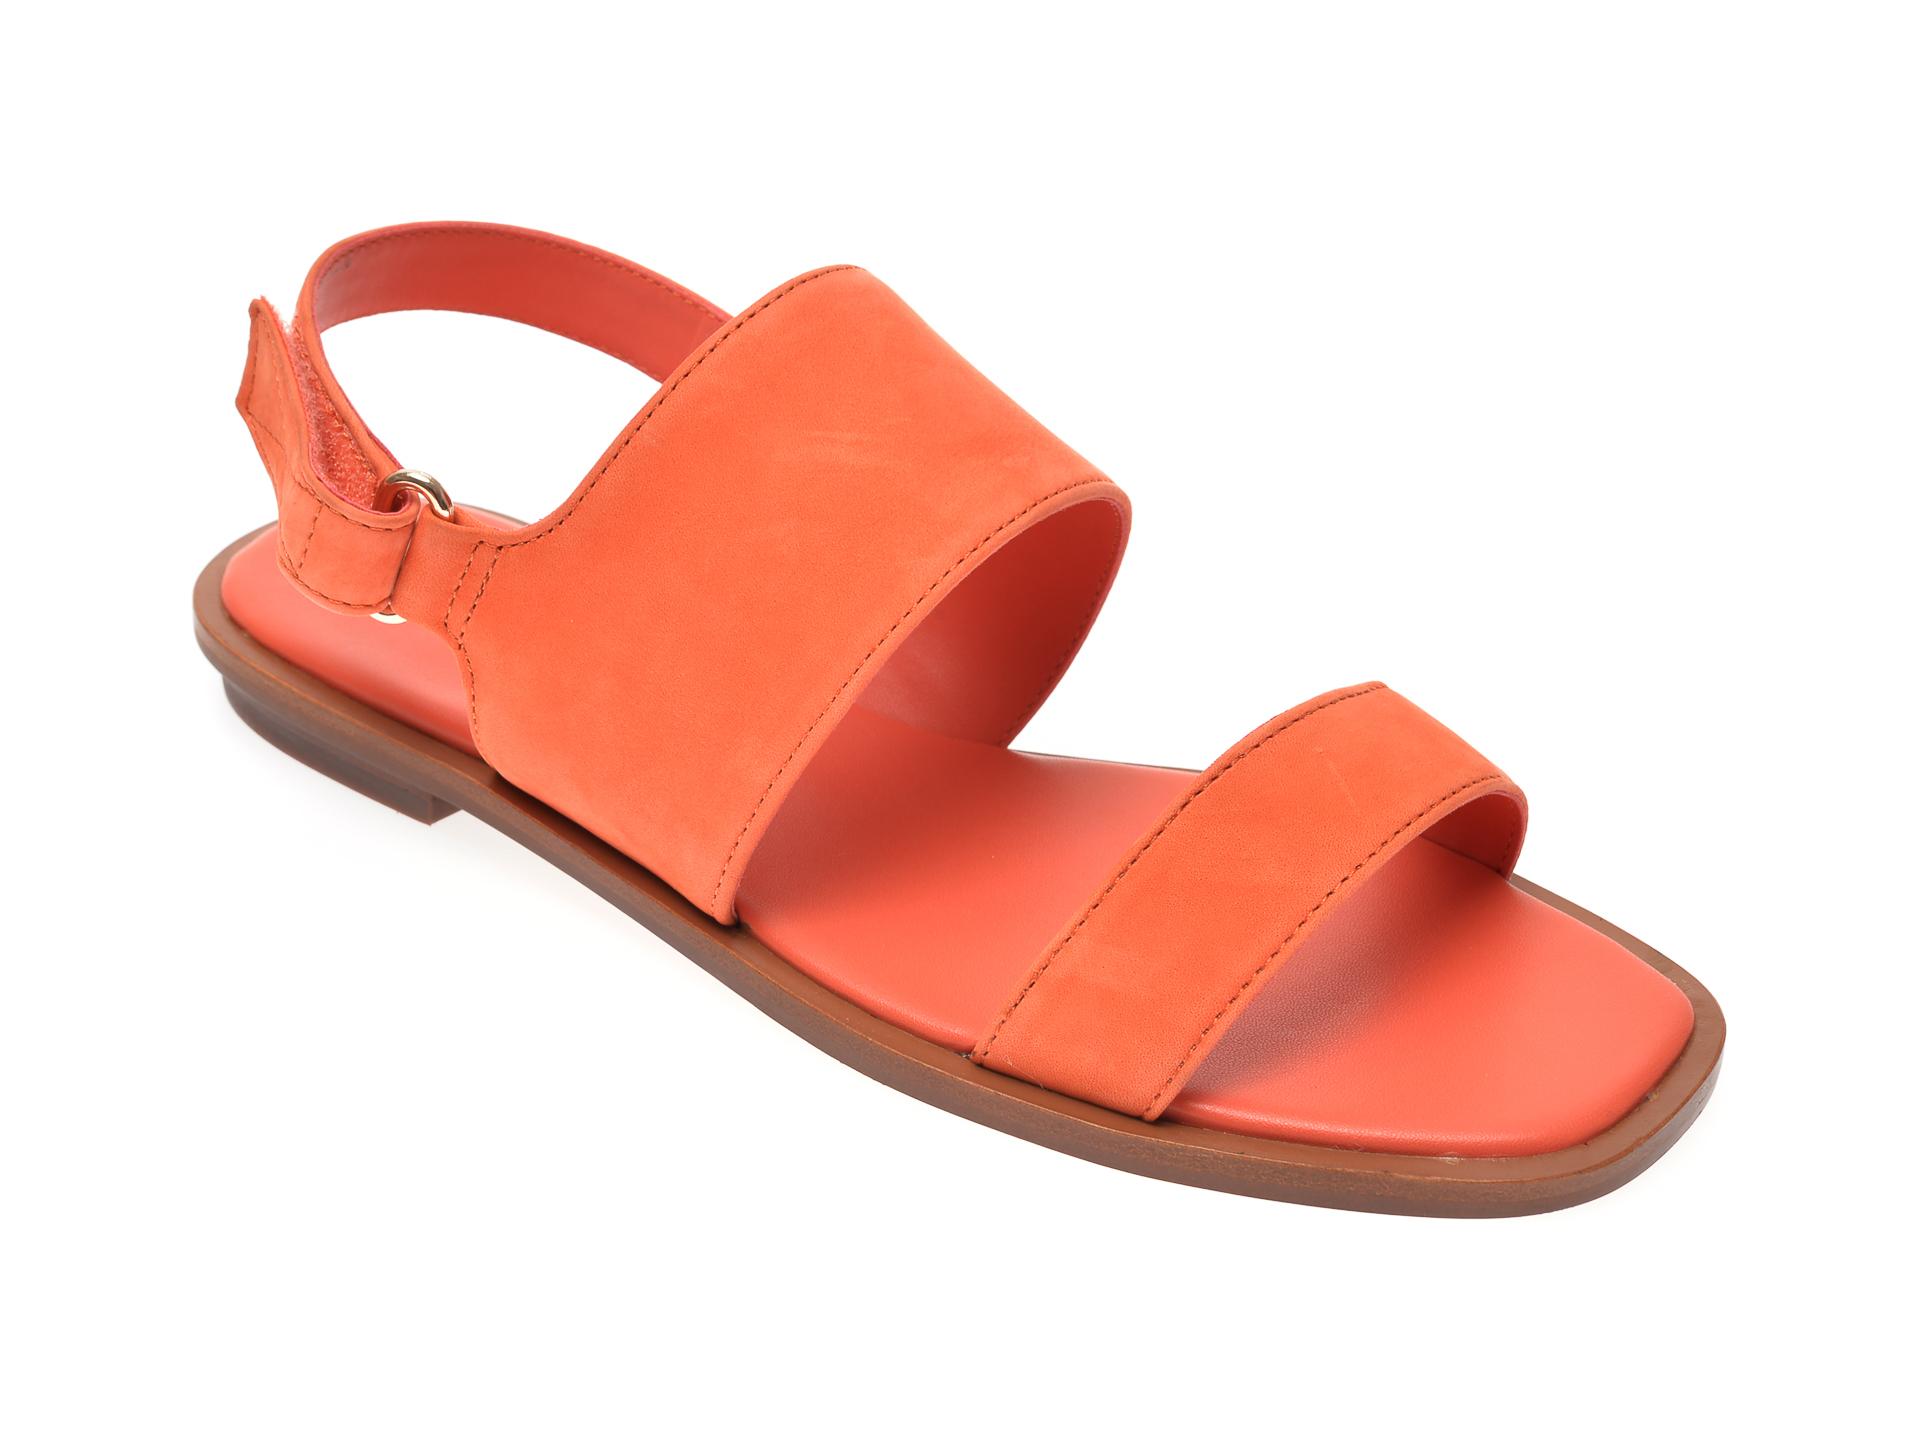 Sandale ALDO portocalii, Sula800, din nabuc